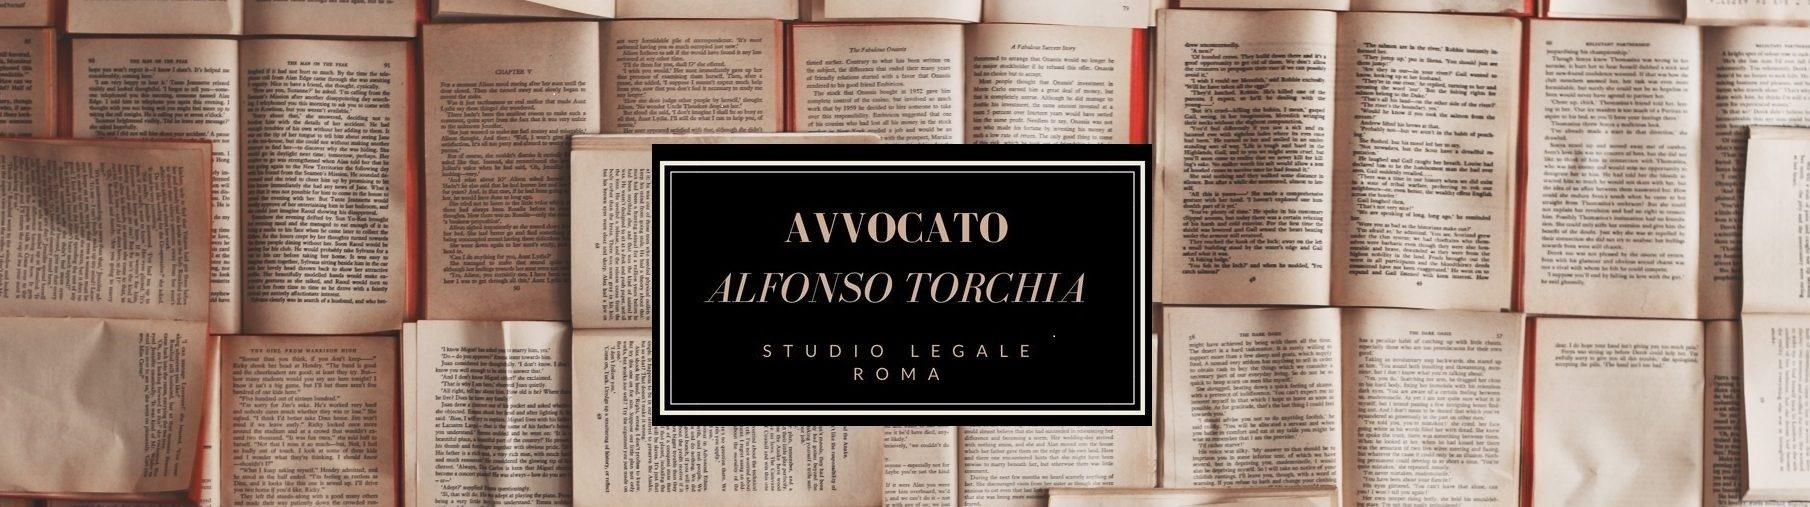 AVVOCATO ALFONSO TORCHIA